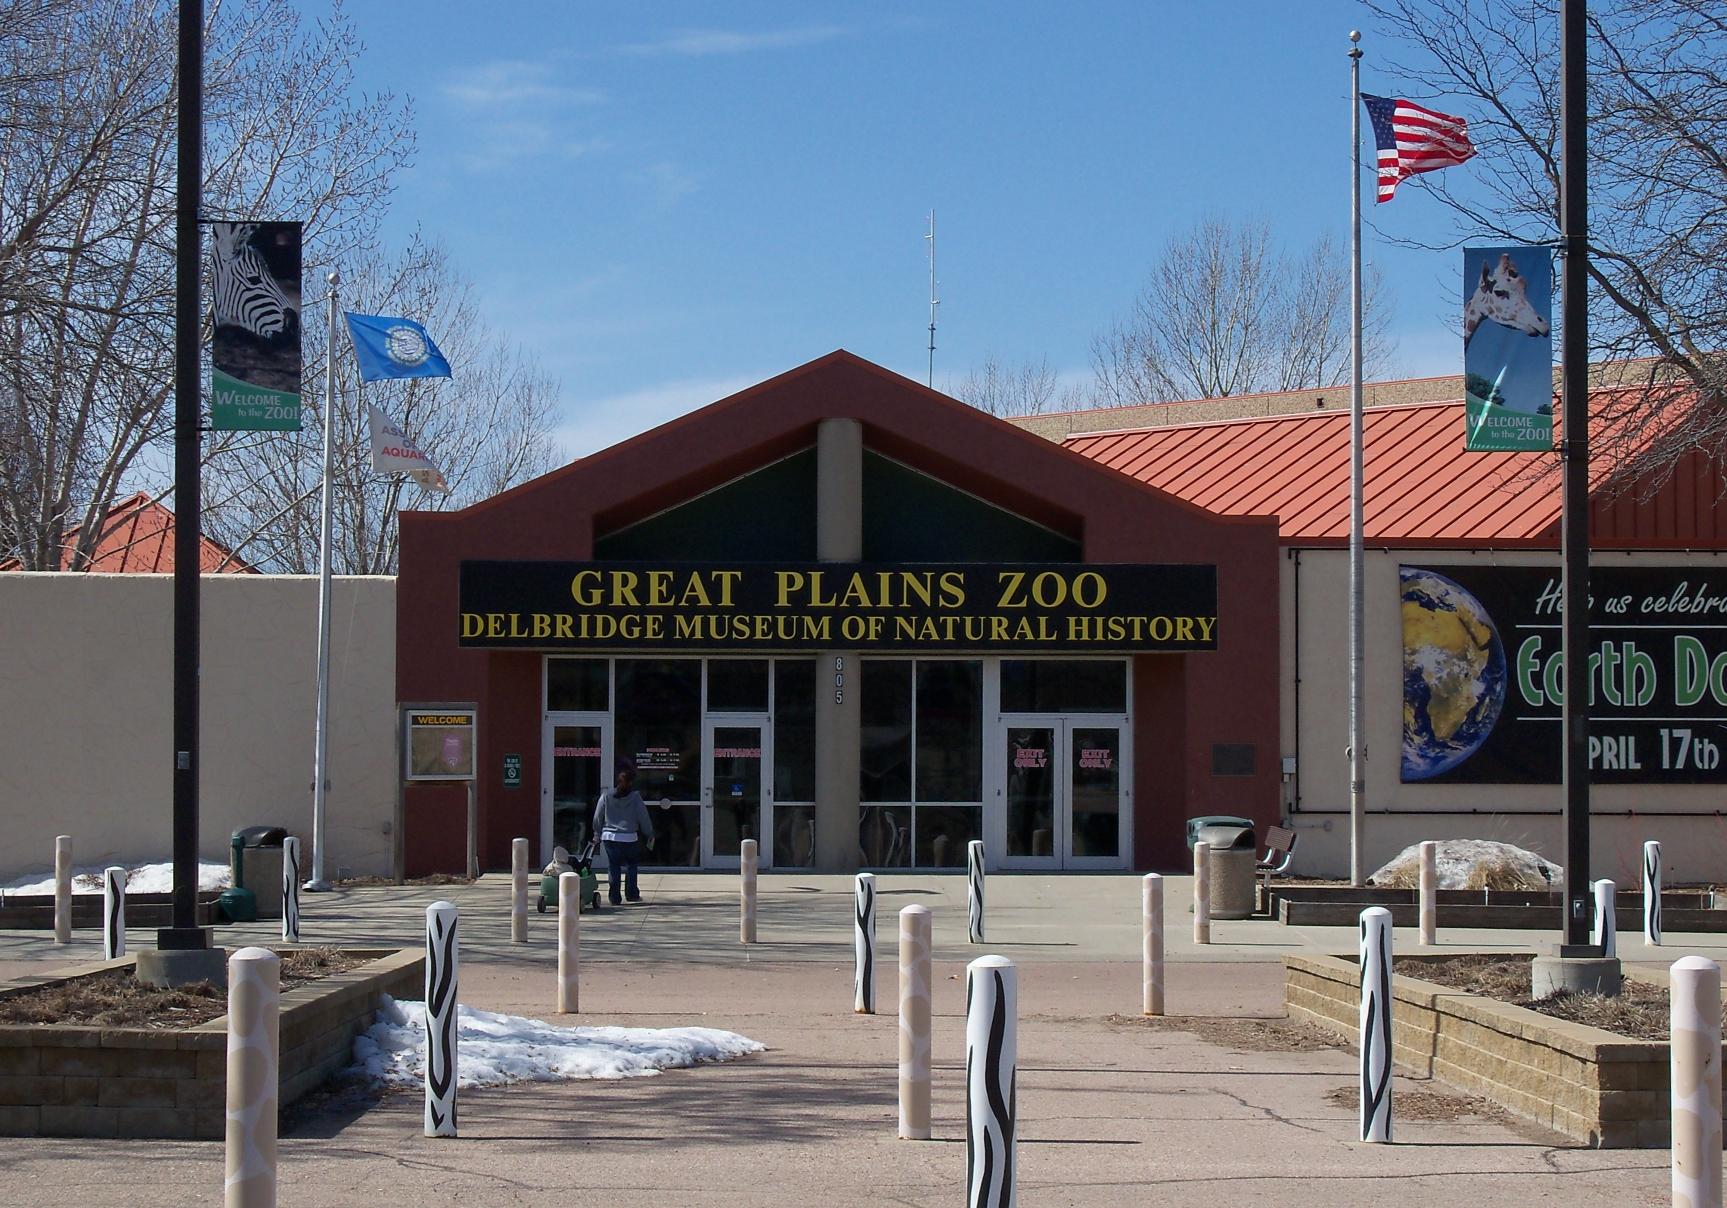 File:Great Plains Zoo entrance 1 jpg - Wikimedia Commons